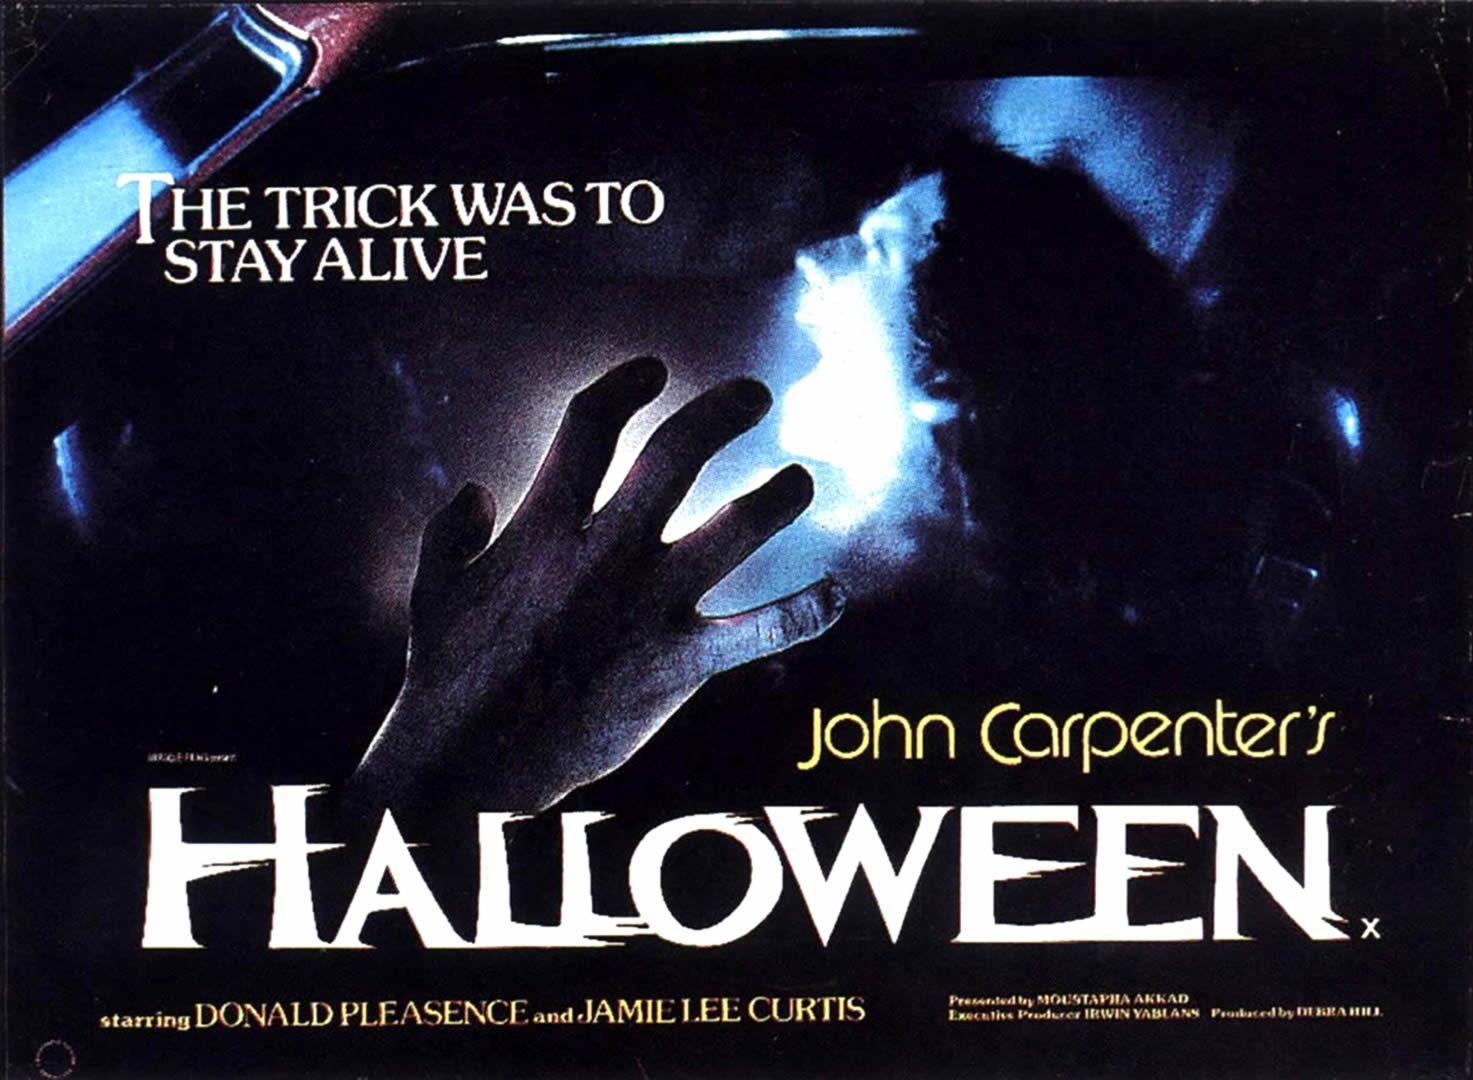 halloween 2 movie wallpaper - photo #16